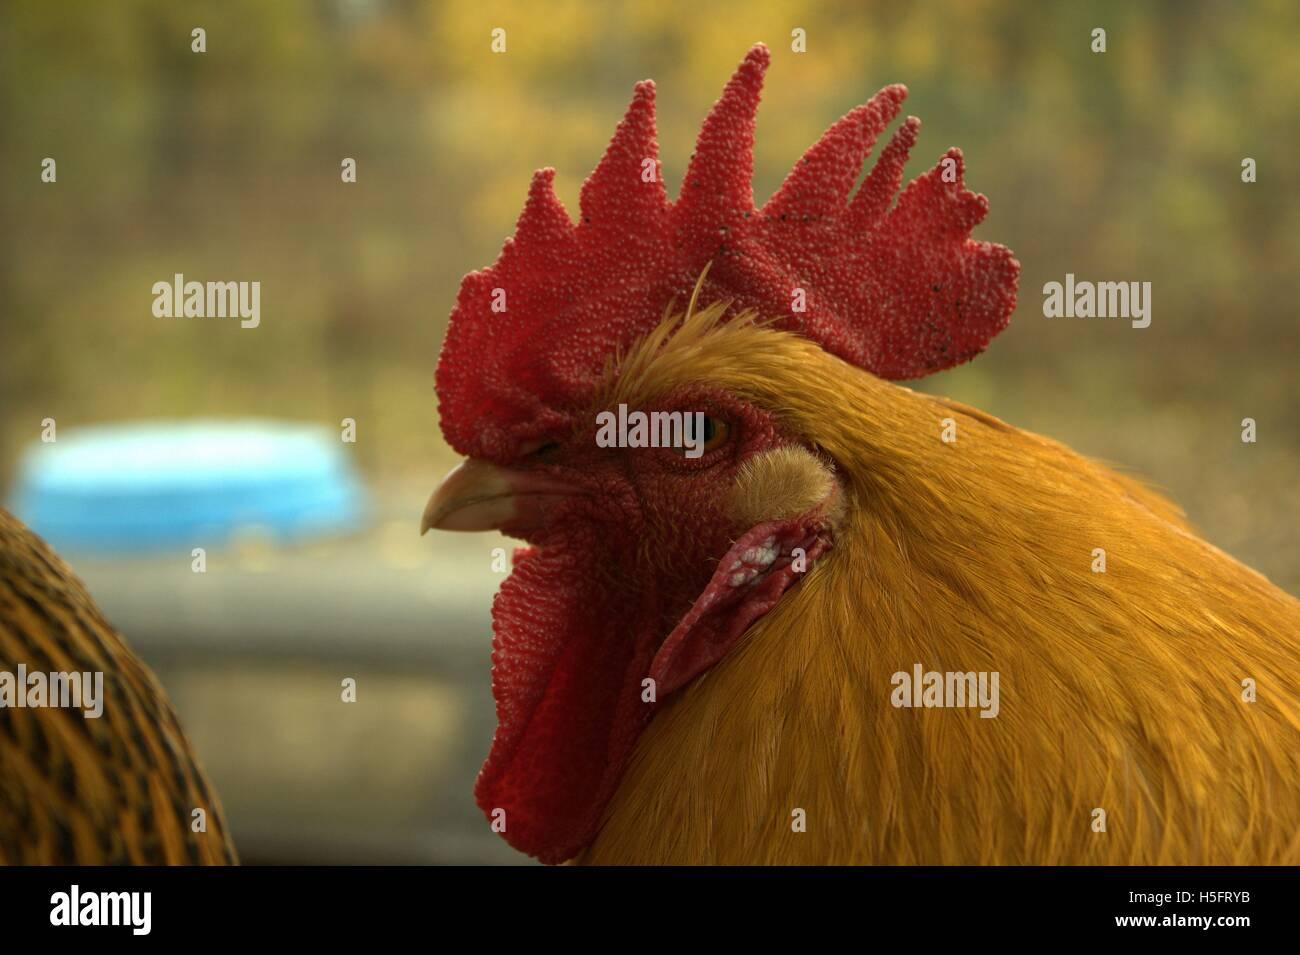 Buff Orpington Rooster Cerrar Imagen De Stock